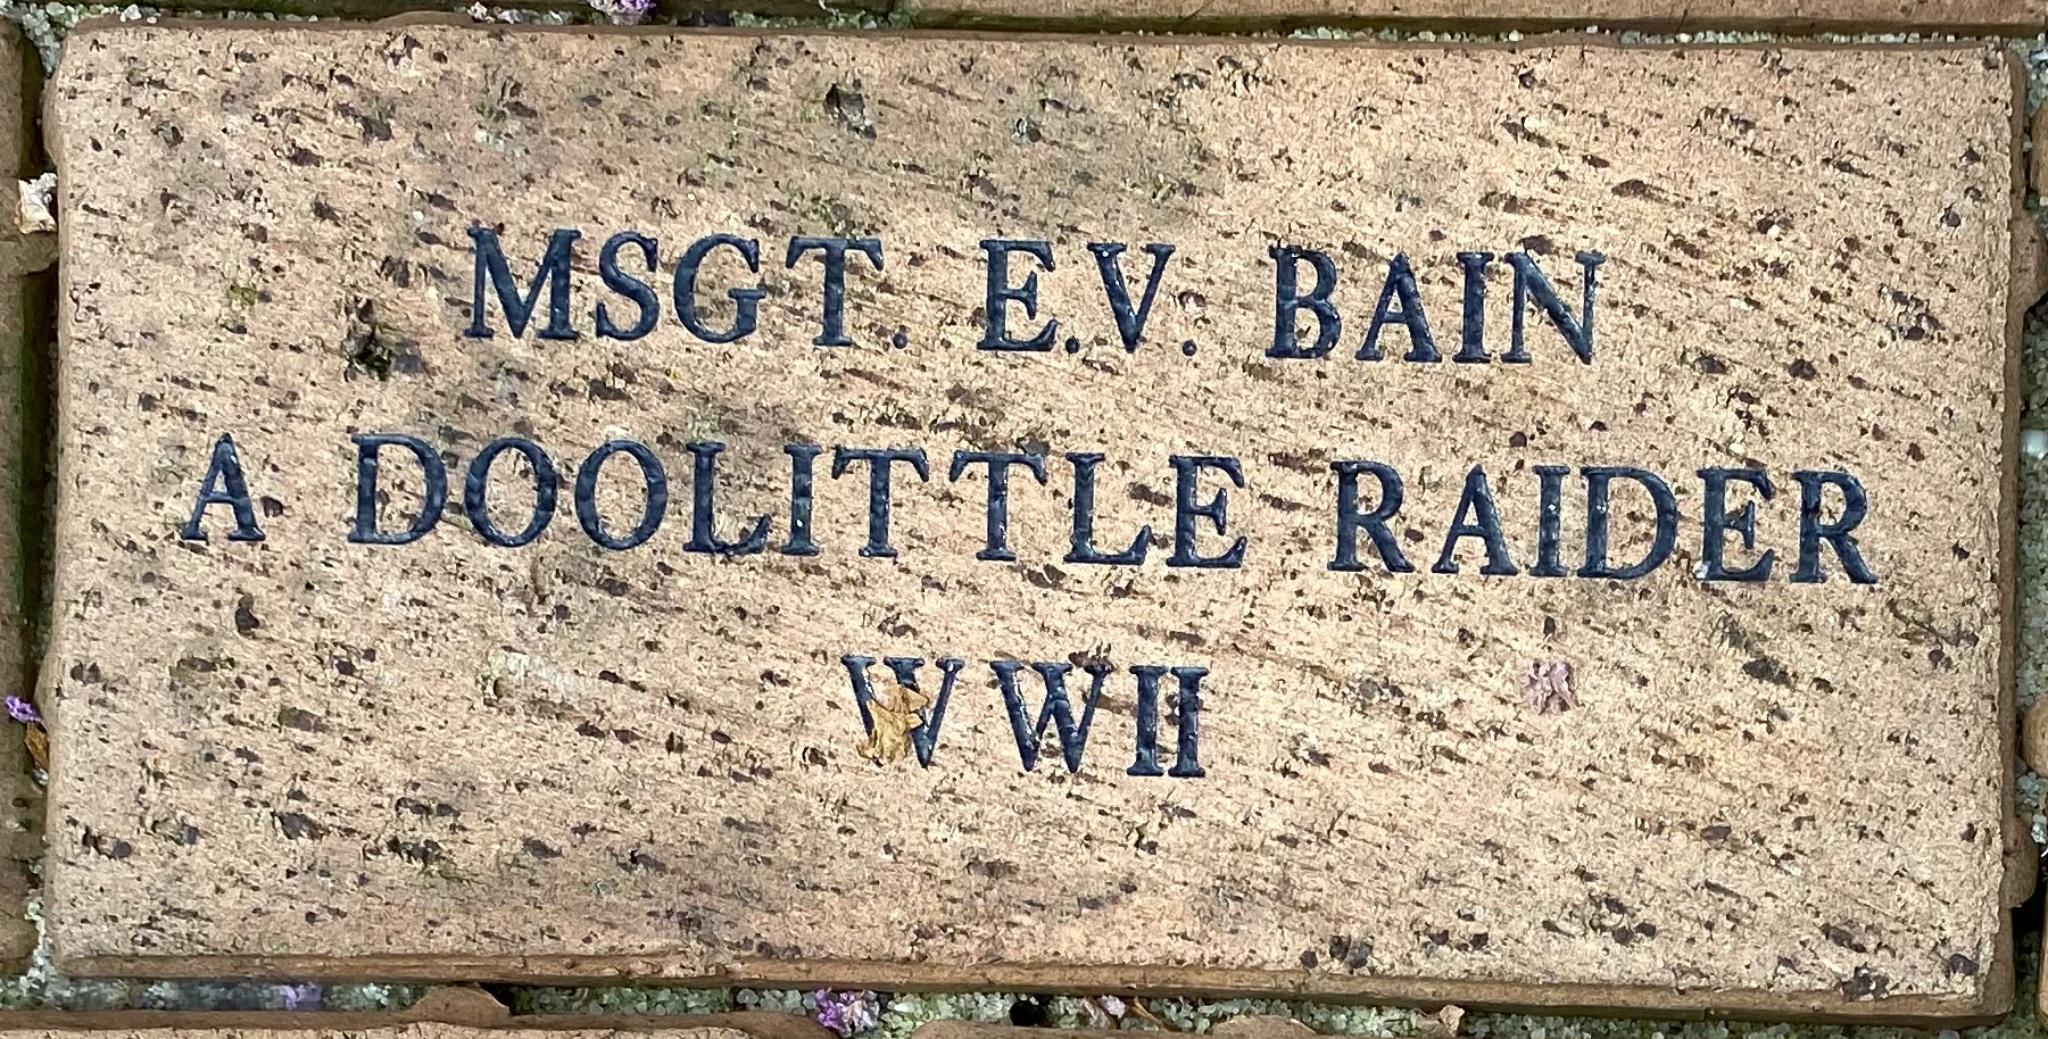 MSGT E. V. BAIN A DOOLITTLE RAIDER WWII